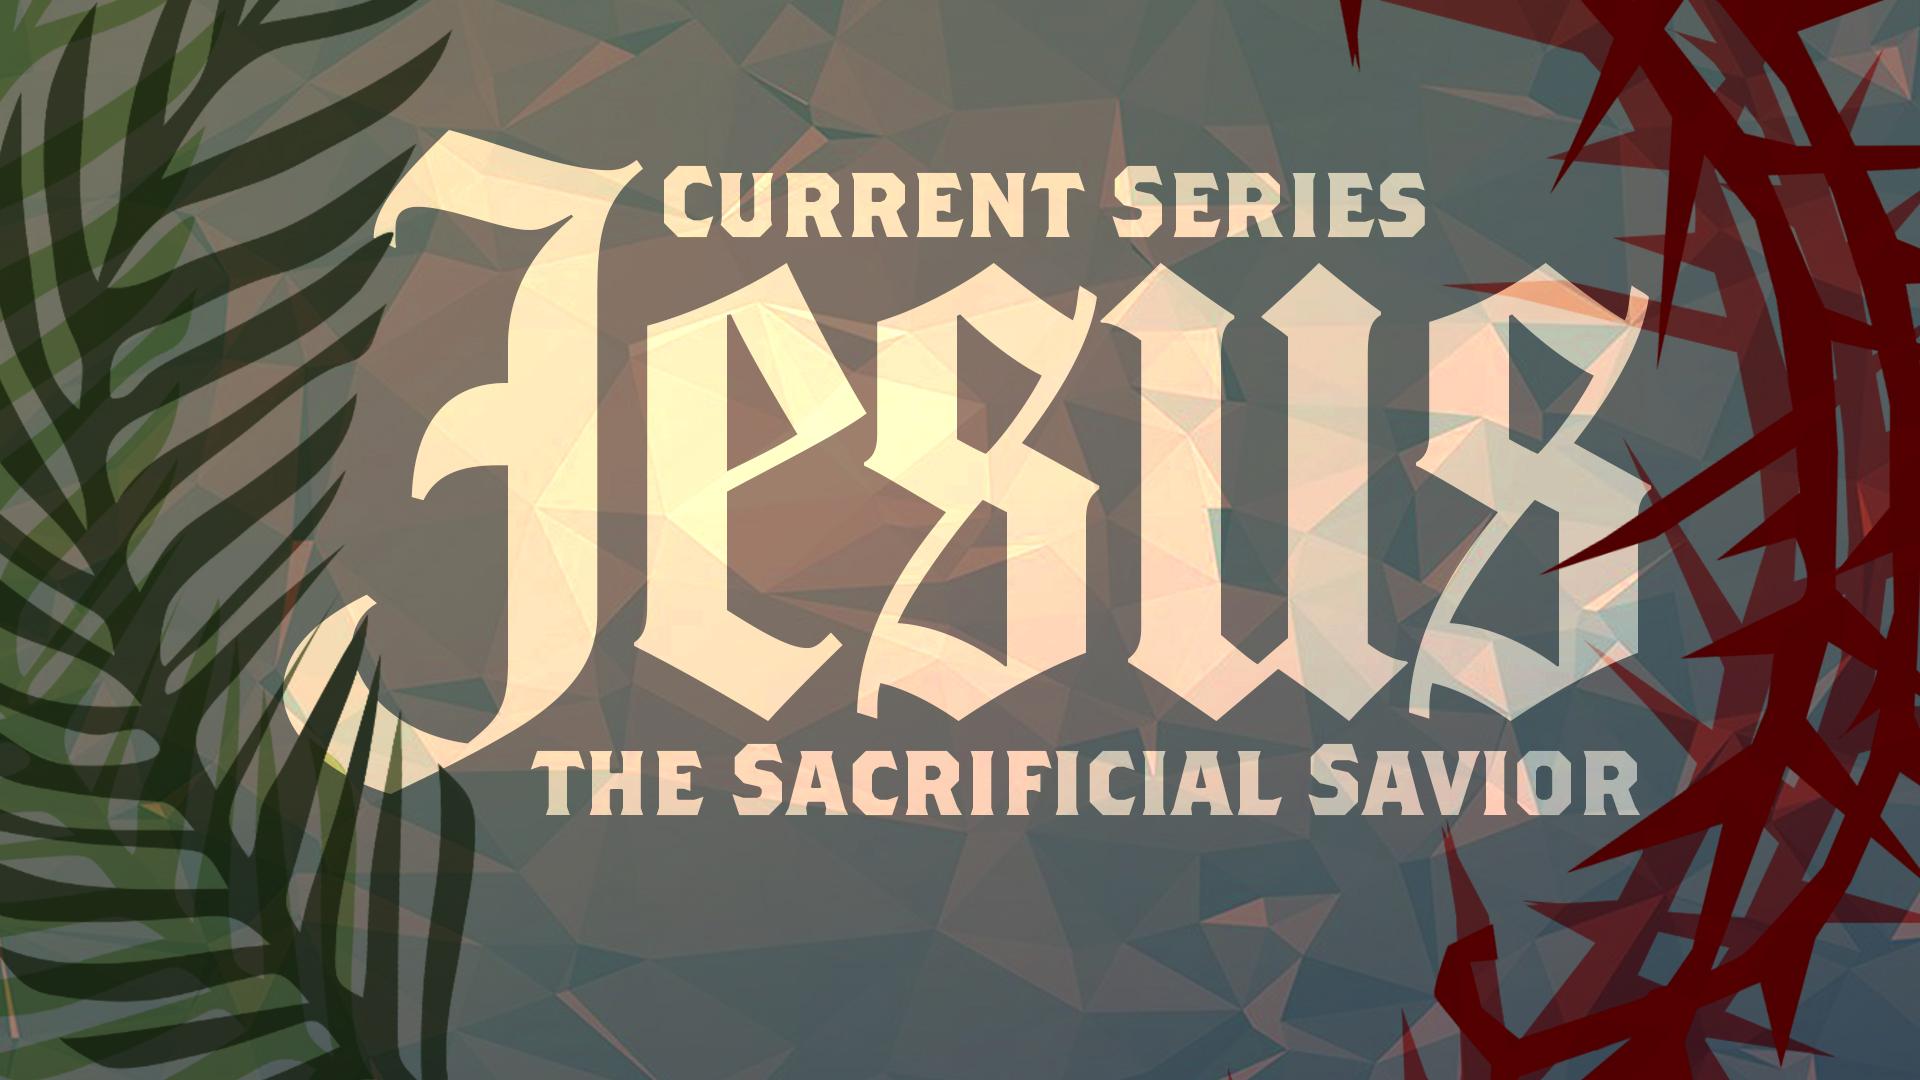 Jesus: The Sacrificial Savior